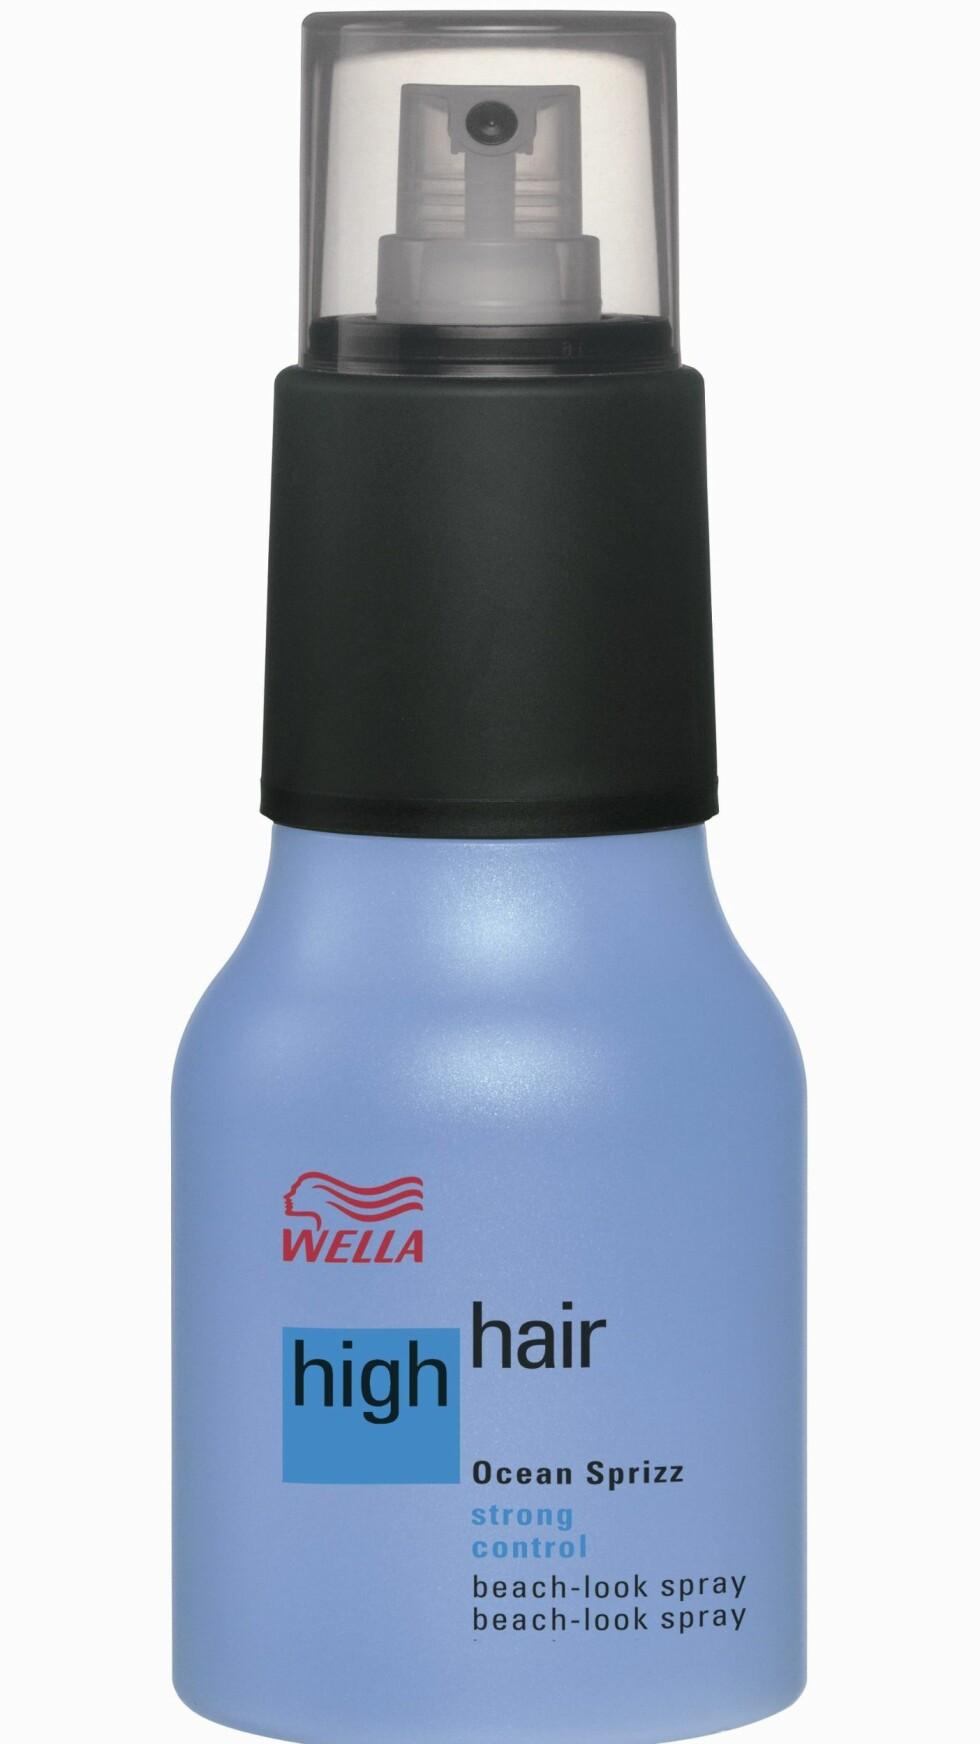 High Hair Ocean Sprizz 200 ml, fra Wella, ca. kr 195.  Foto: Produsenten